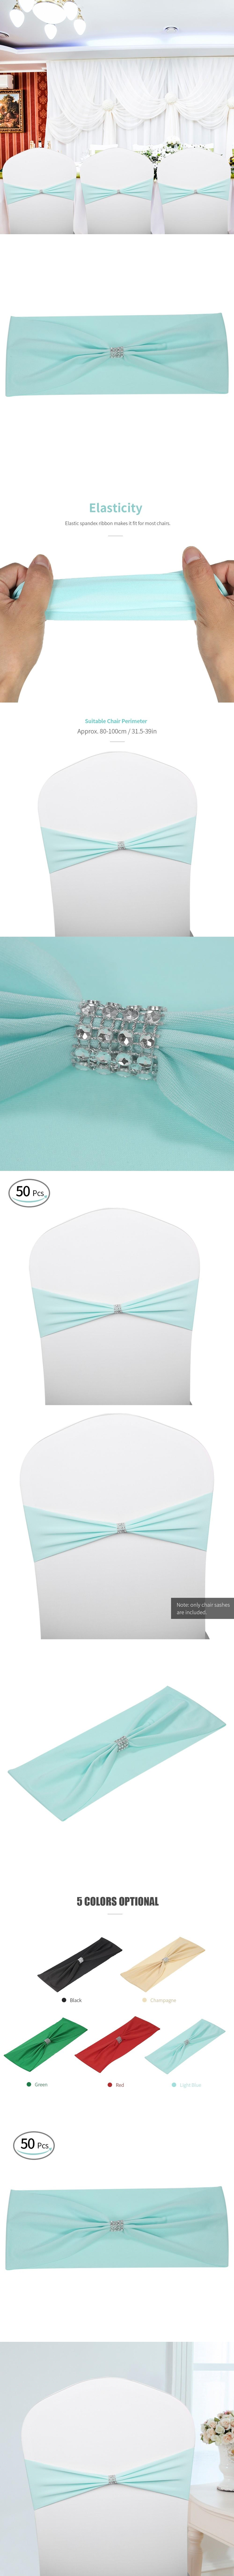 50PCS Elastic Spandex Chair Cover Sashes Bows Wedding Decorations W8I4